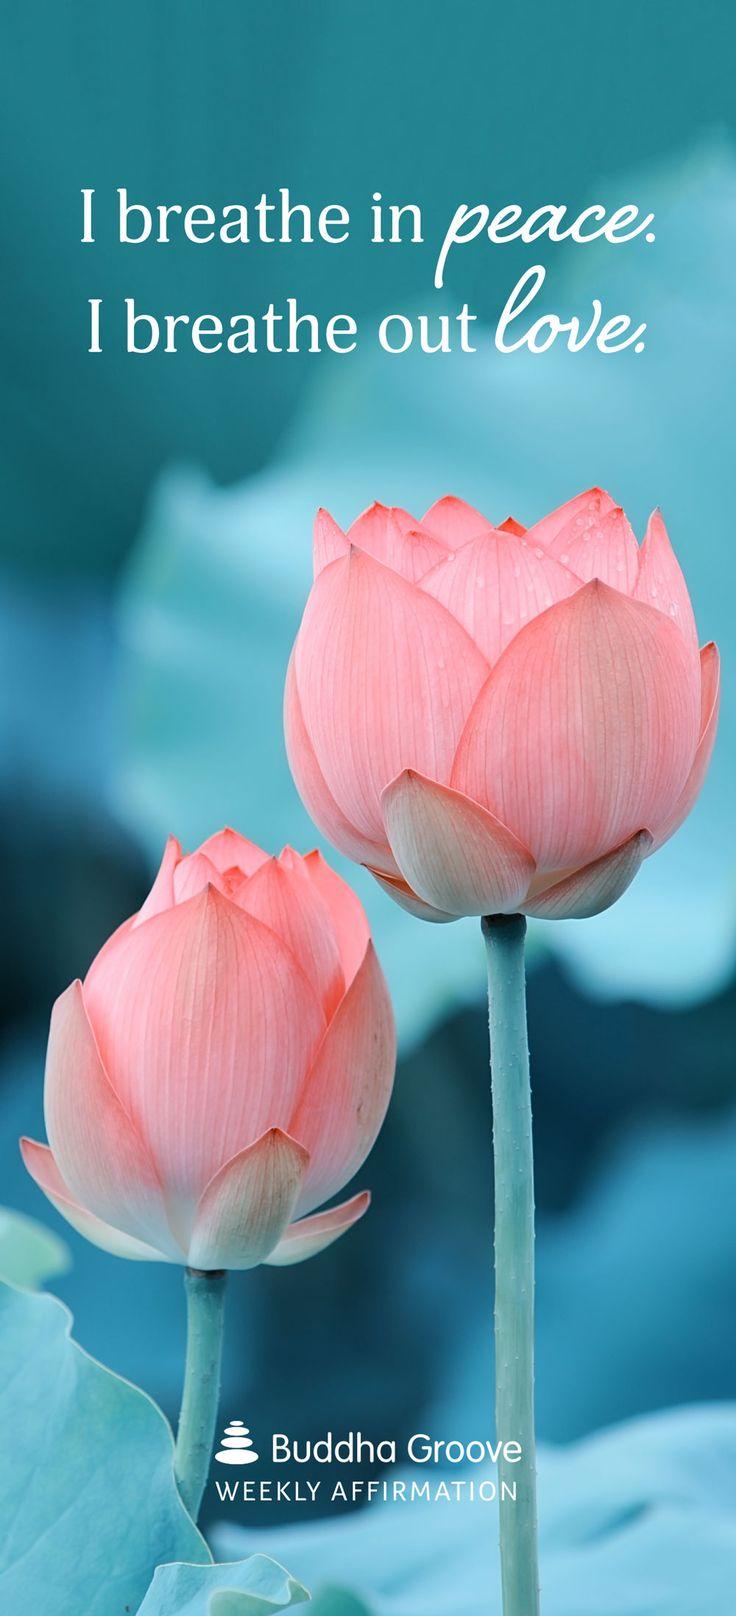 Buddha lotus flower quote gallery flower decoration ideas lotus flower quote buddha images flower decoration ideas buddha lotus flower quote image collections flower decoration mightylinksfo